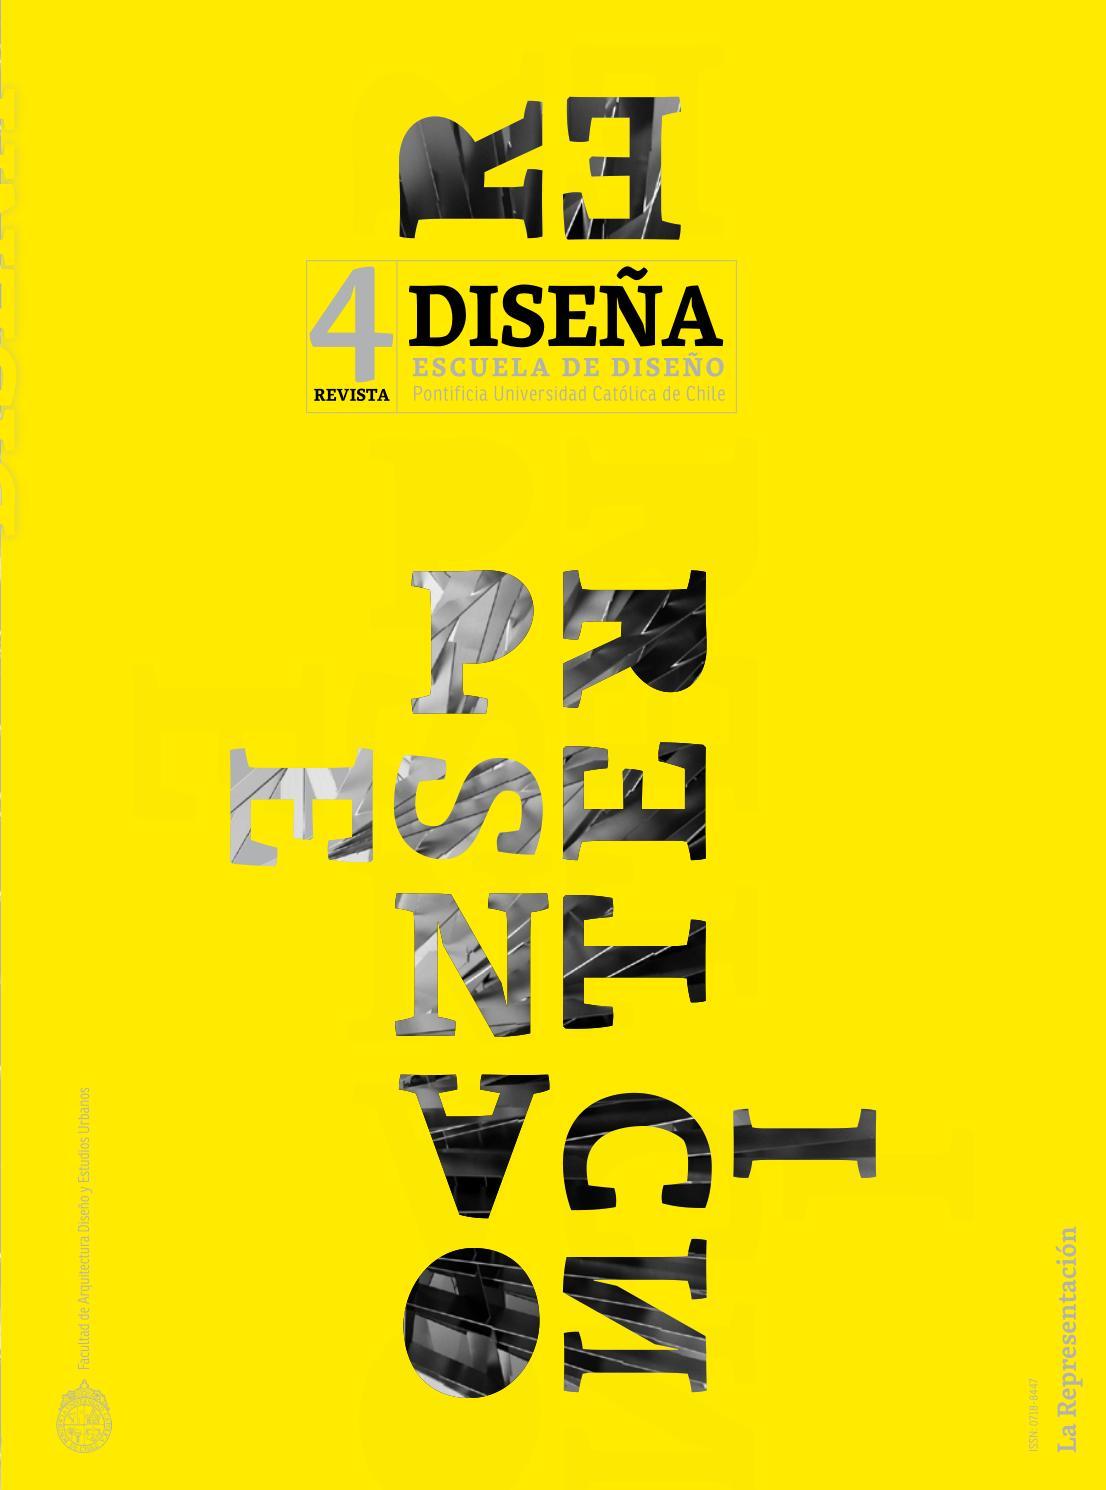 Revistadisena 4 by disenouc - issuu